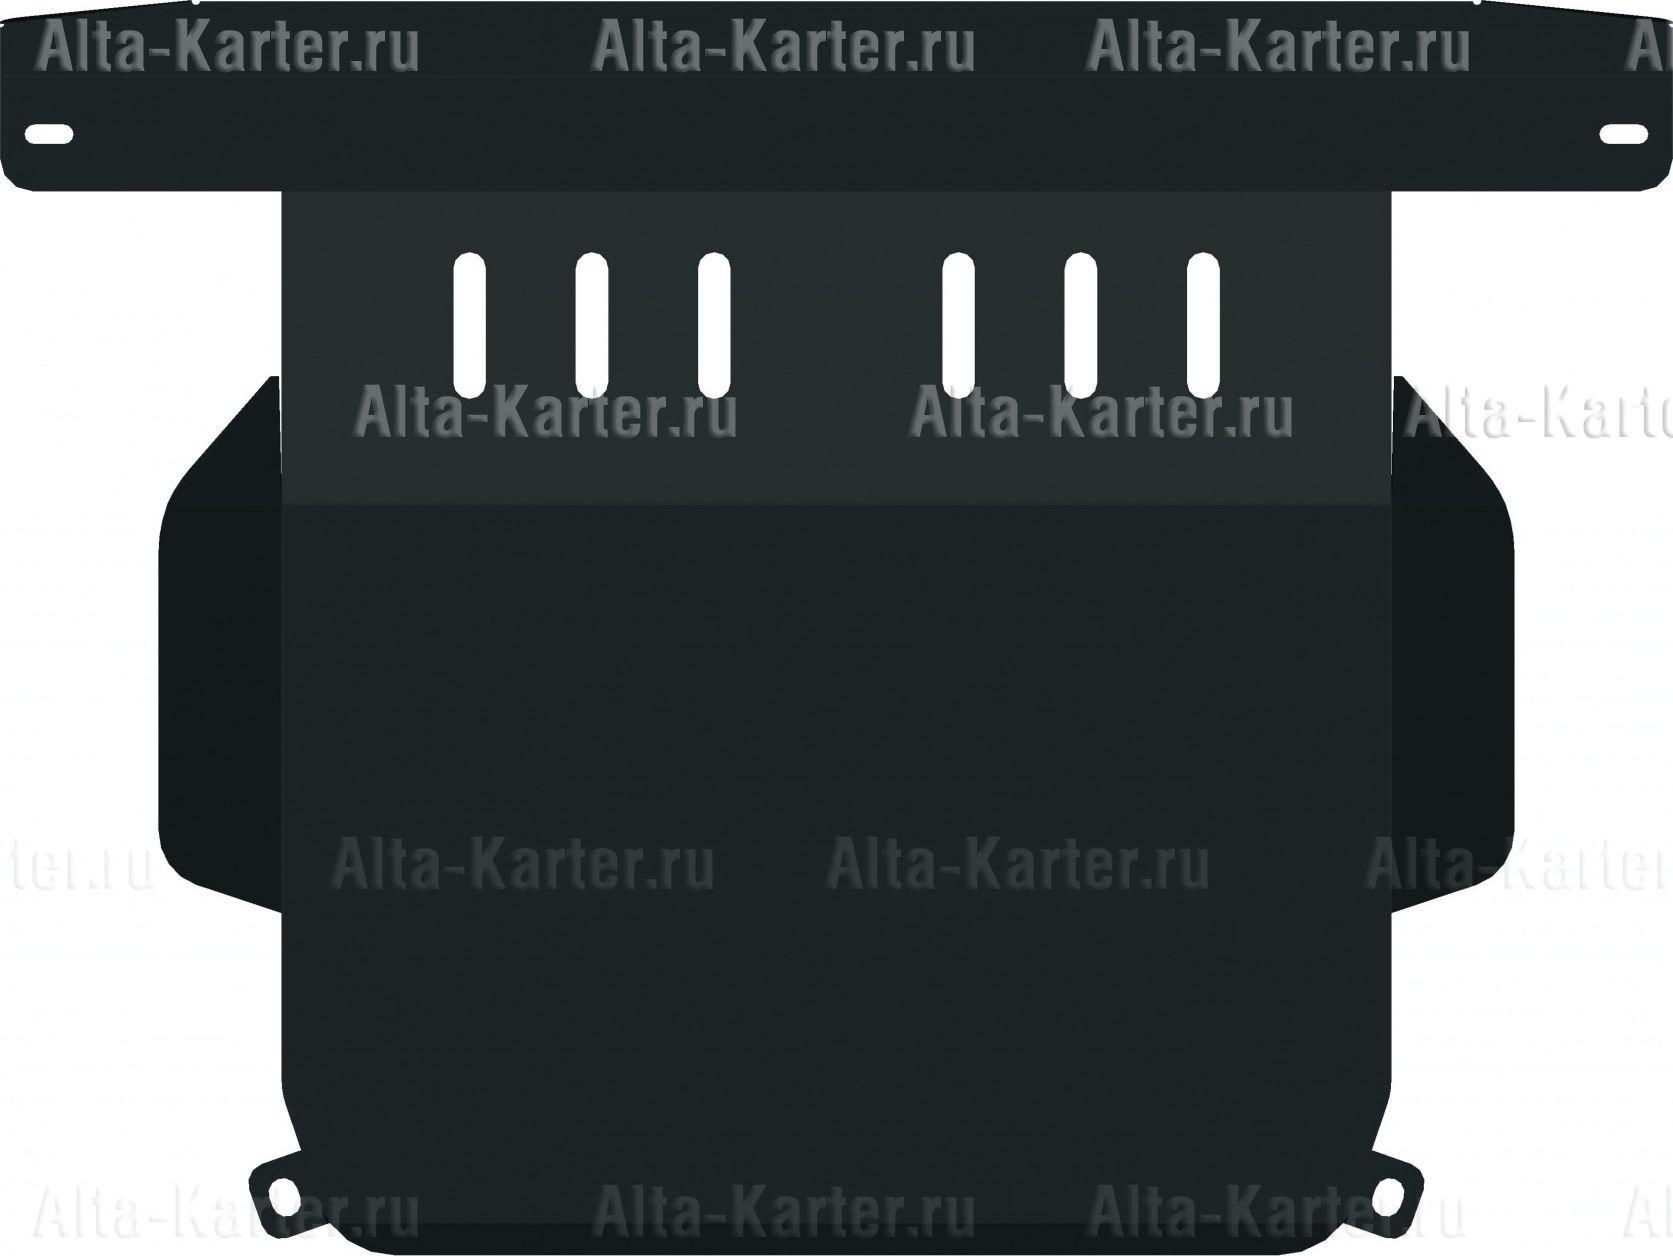 Защита Alfeco для картера и КПП Suzuki Liana 4x4 2001-2007. Артикул ALF.23.09